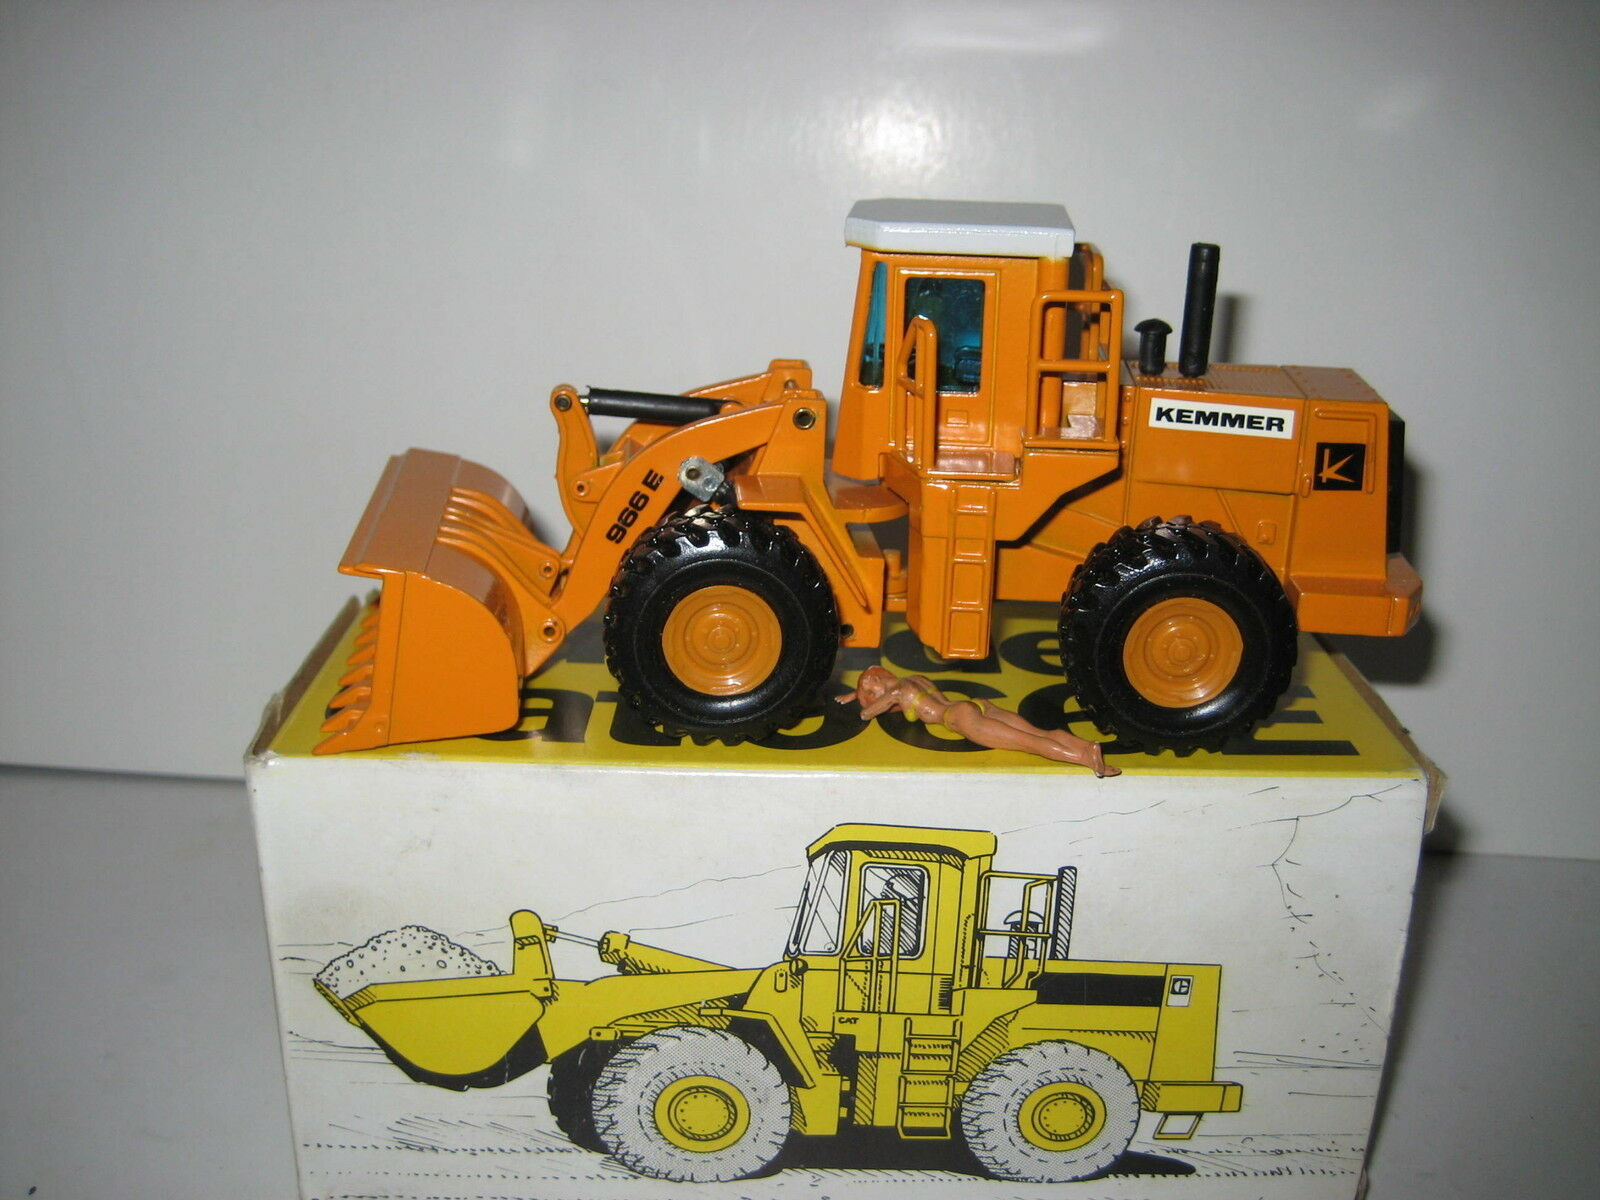 Caterpillar 966 E Glisseur PFLEGER #237 NZG 1:50 neuf neuf neuf dans sa boîte | Excellente Qualité  e6bf4d